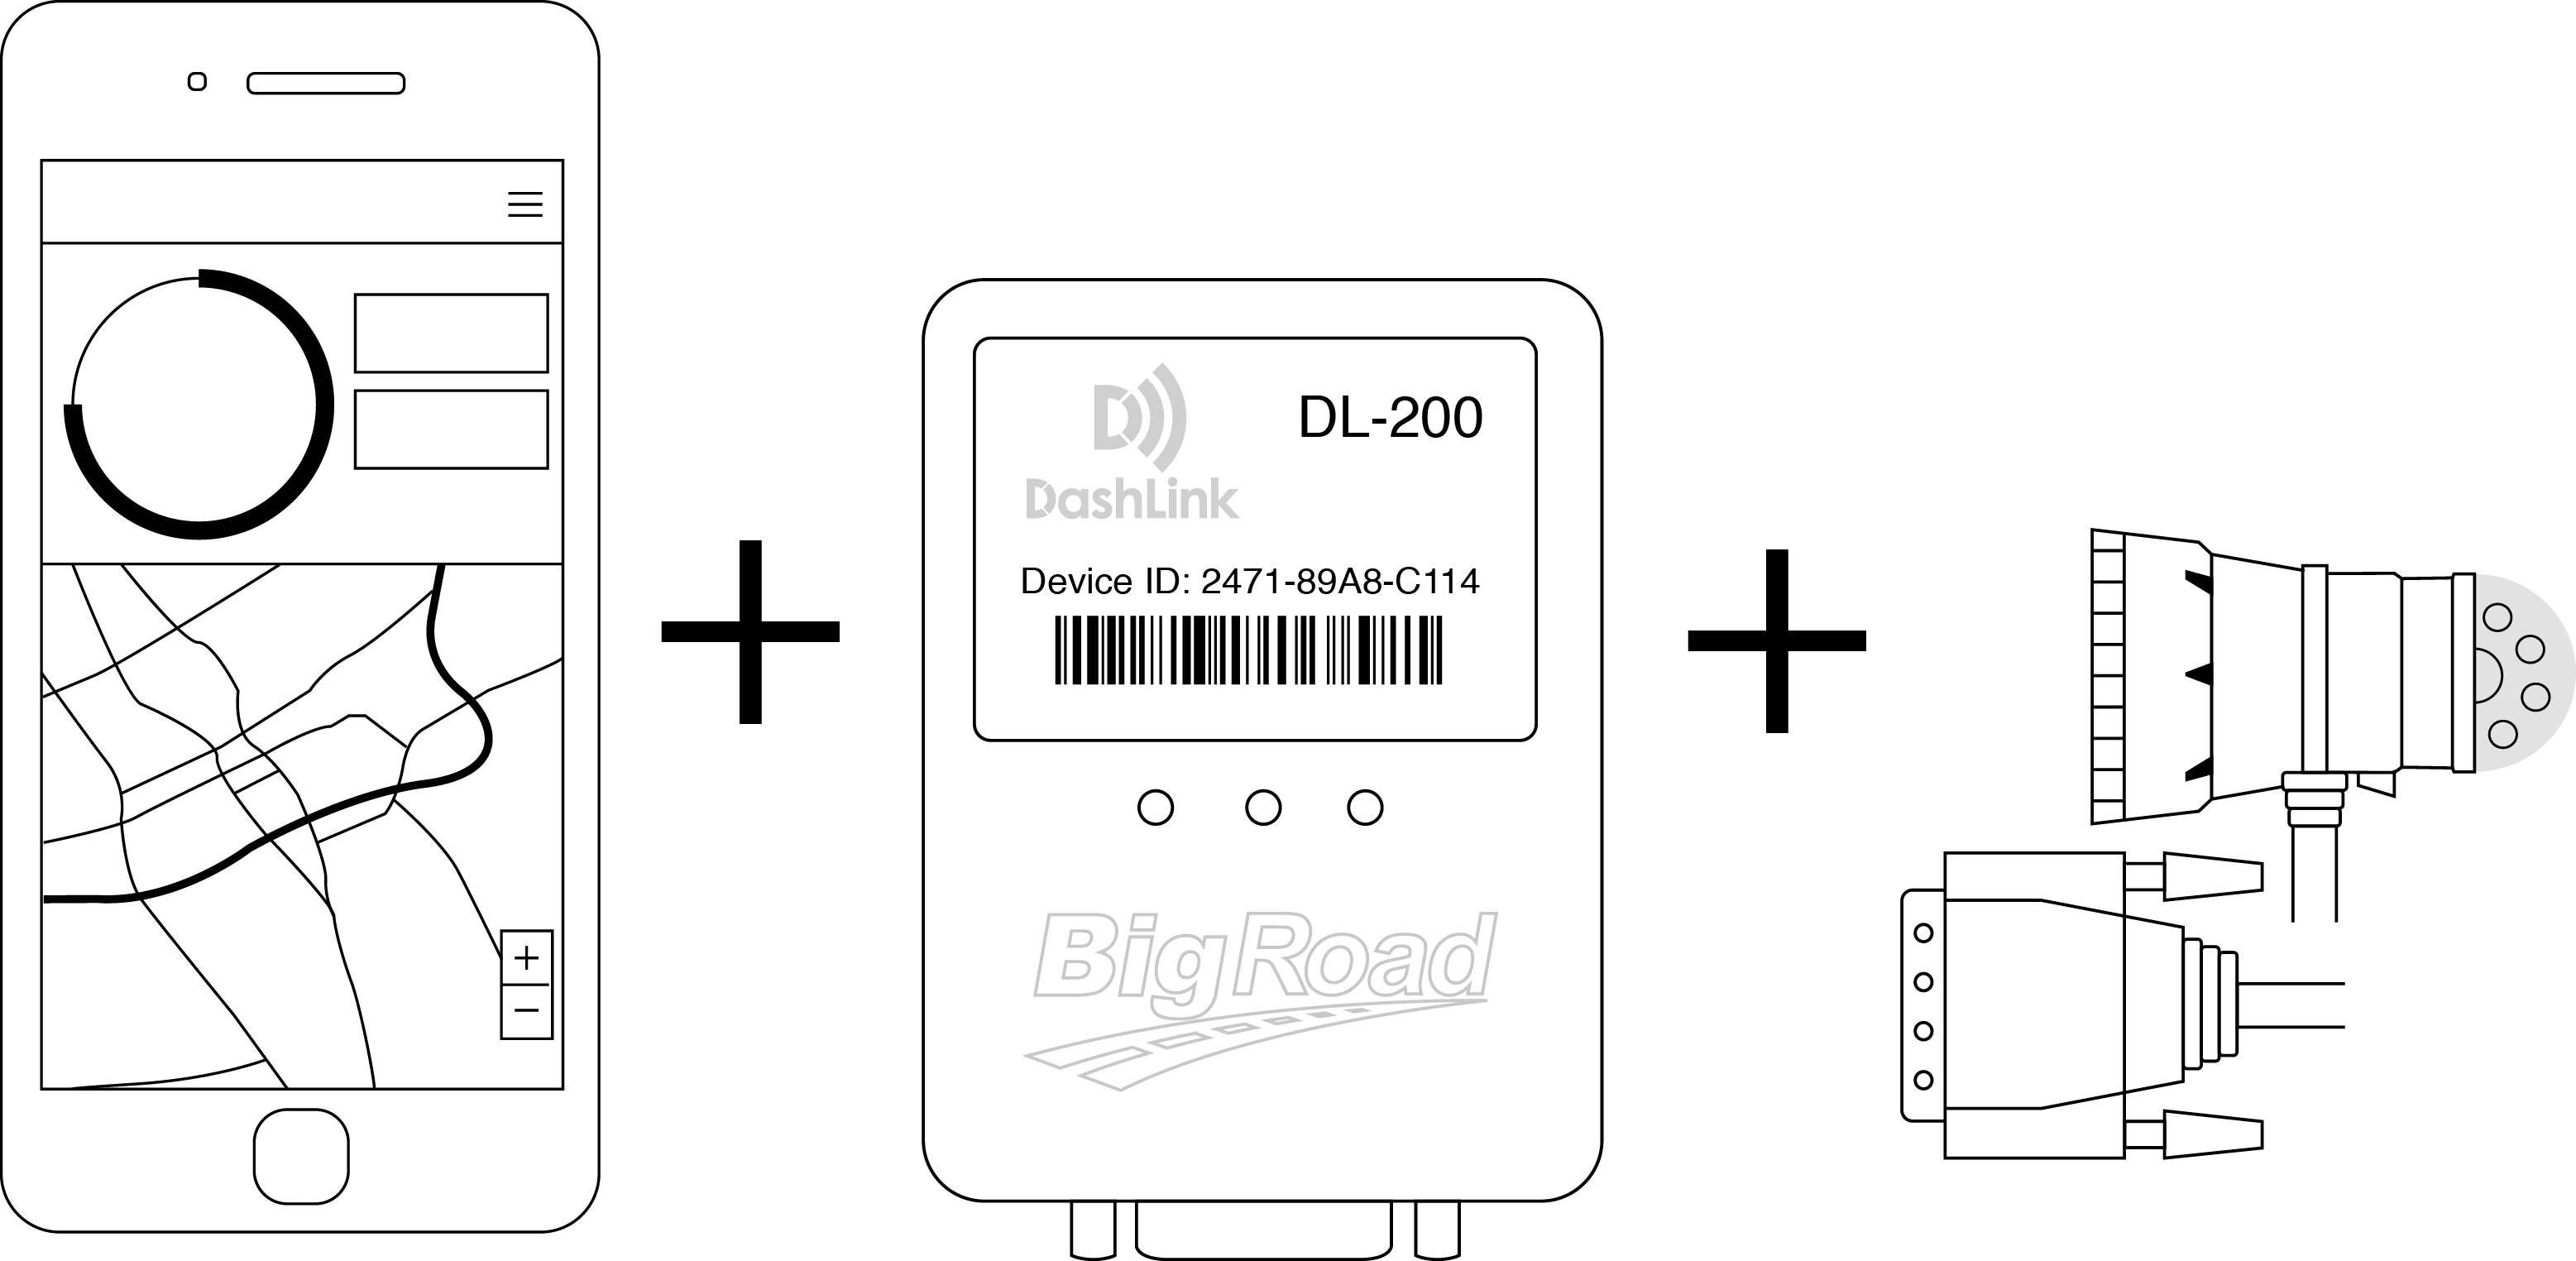 BigRoad's compliance solutions: BigRoad Mobile App, DashLink ELD, and Cord